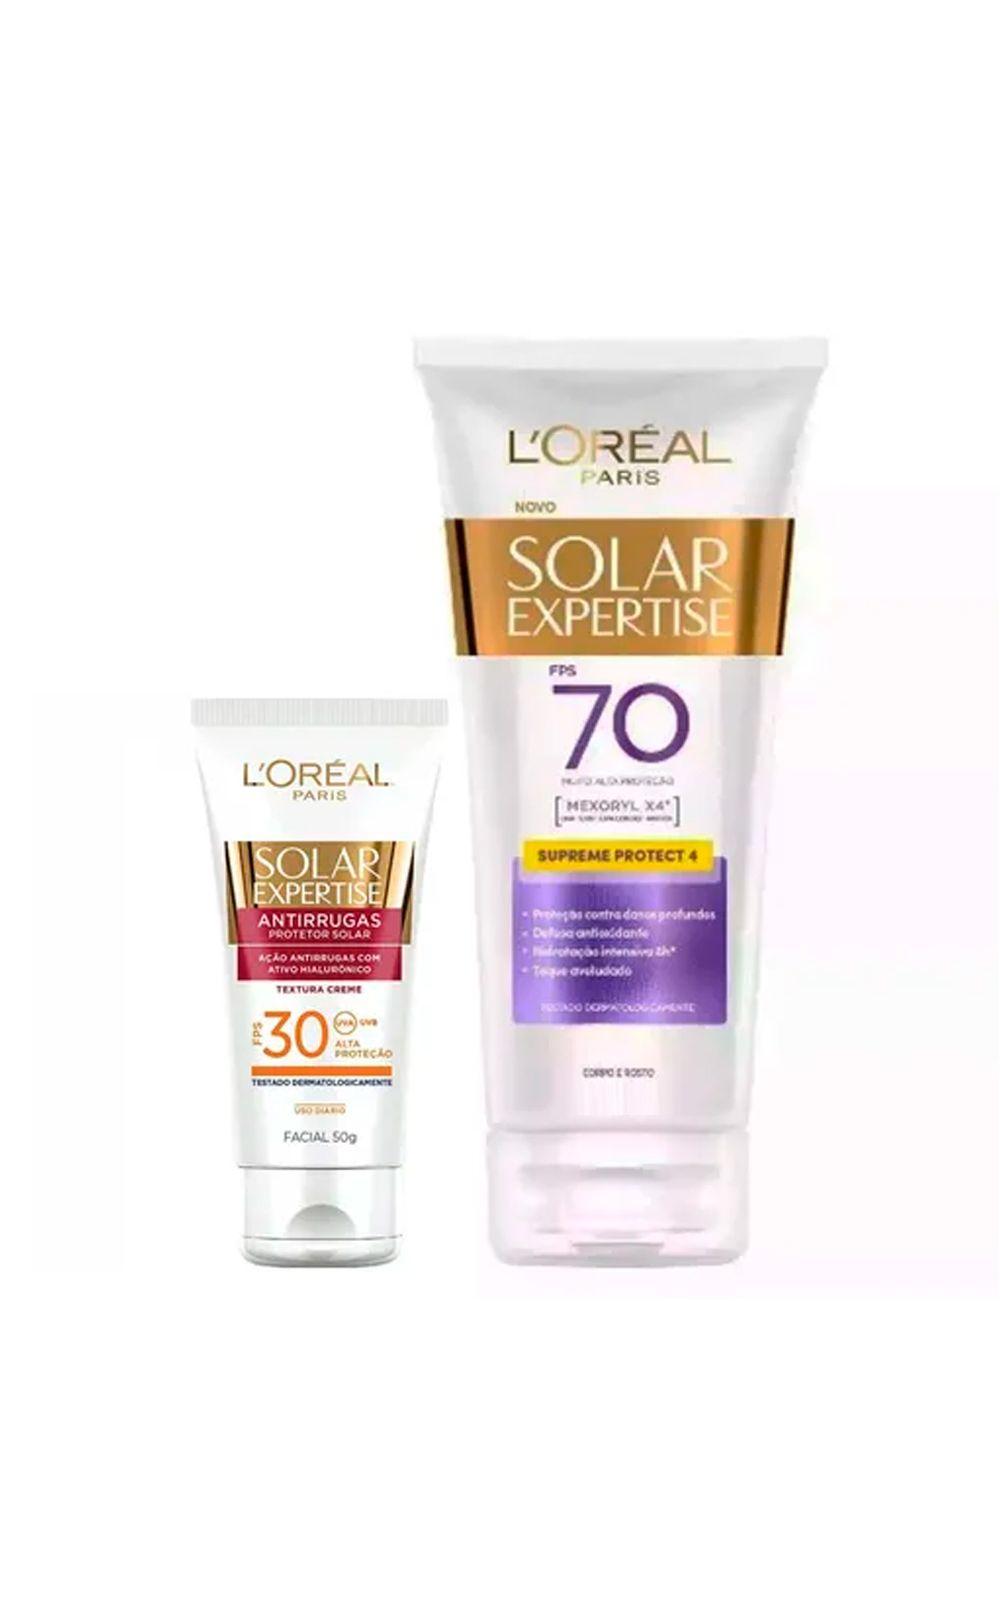 Foto 1 - L'Oréal Paris Solar Expertise Ganhe Solar Expertise Facial Antirrugas Kit - Protetor Solar Corporal + Protetor Solar Facial - Kit